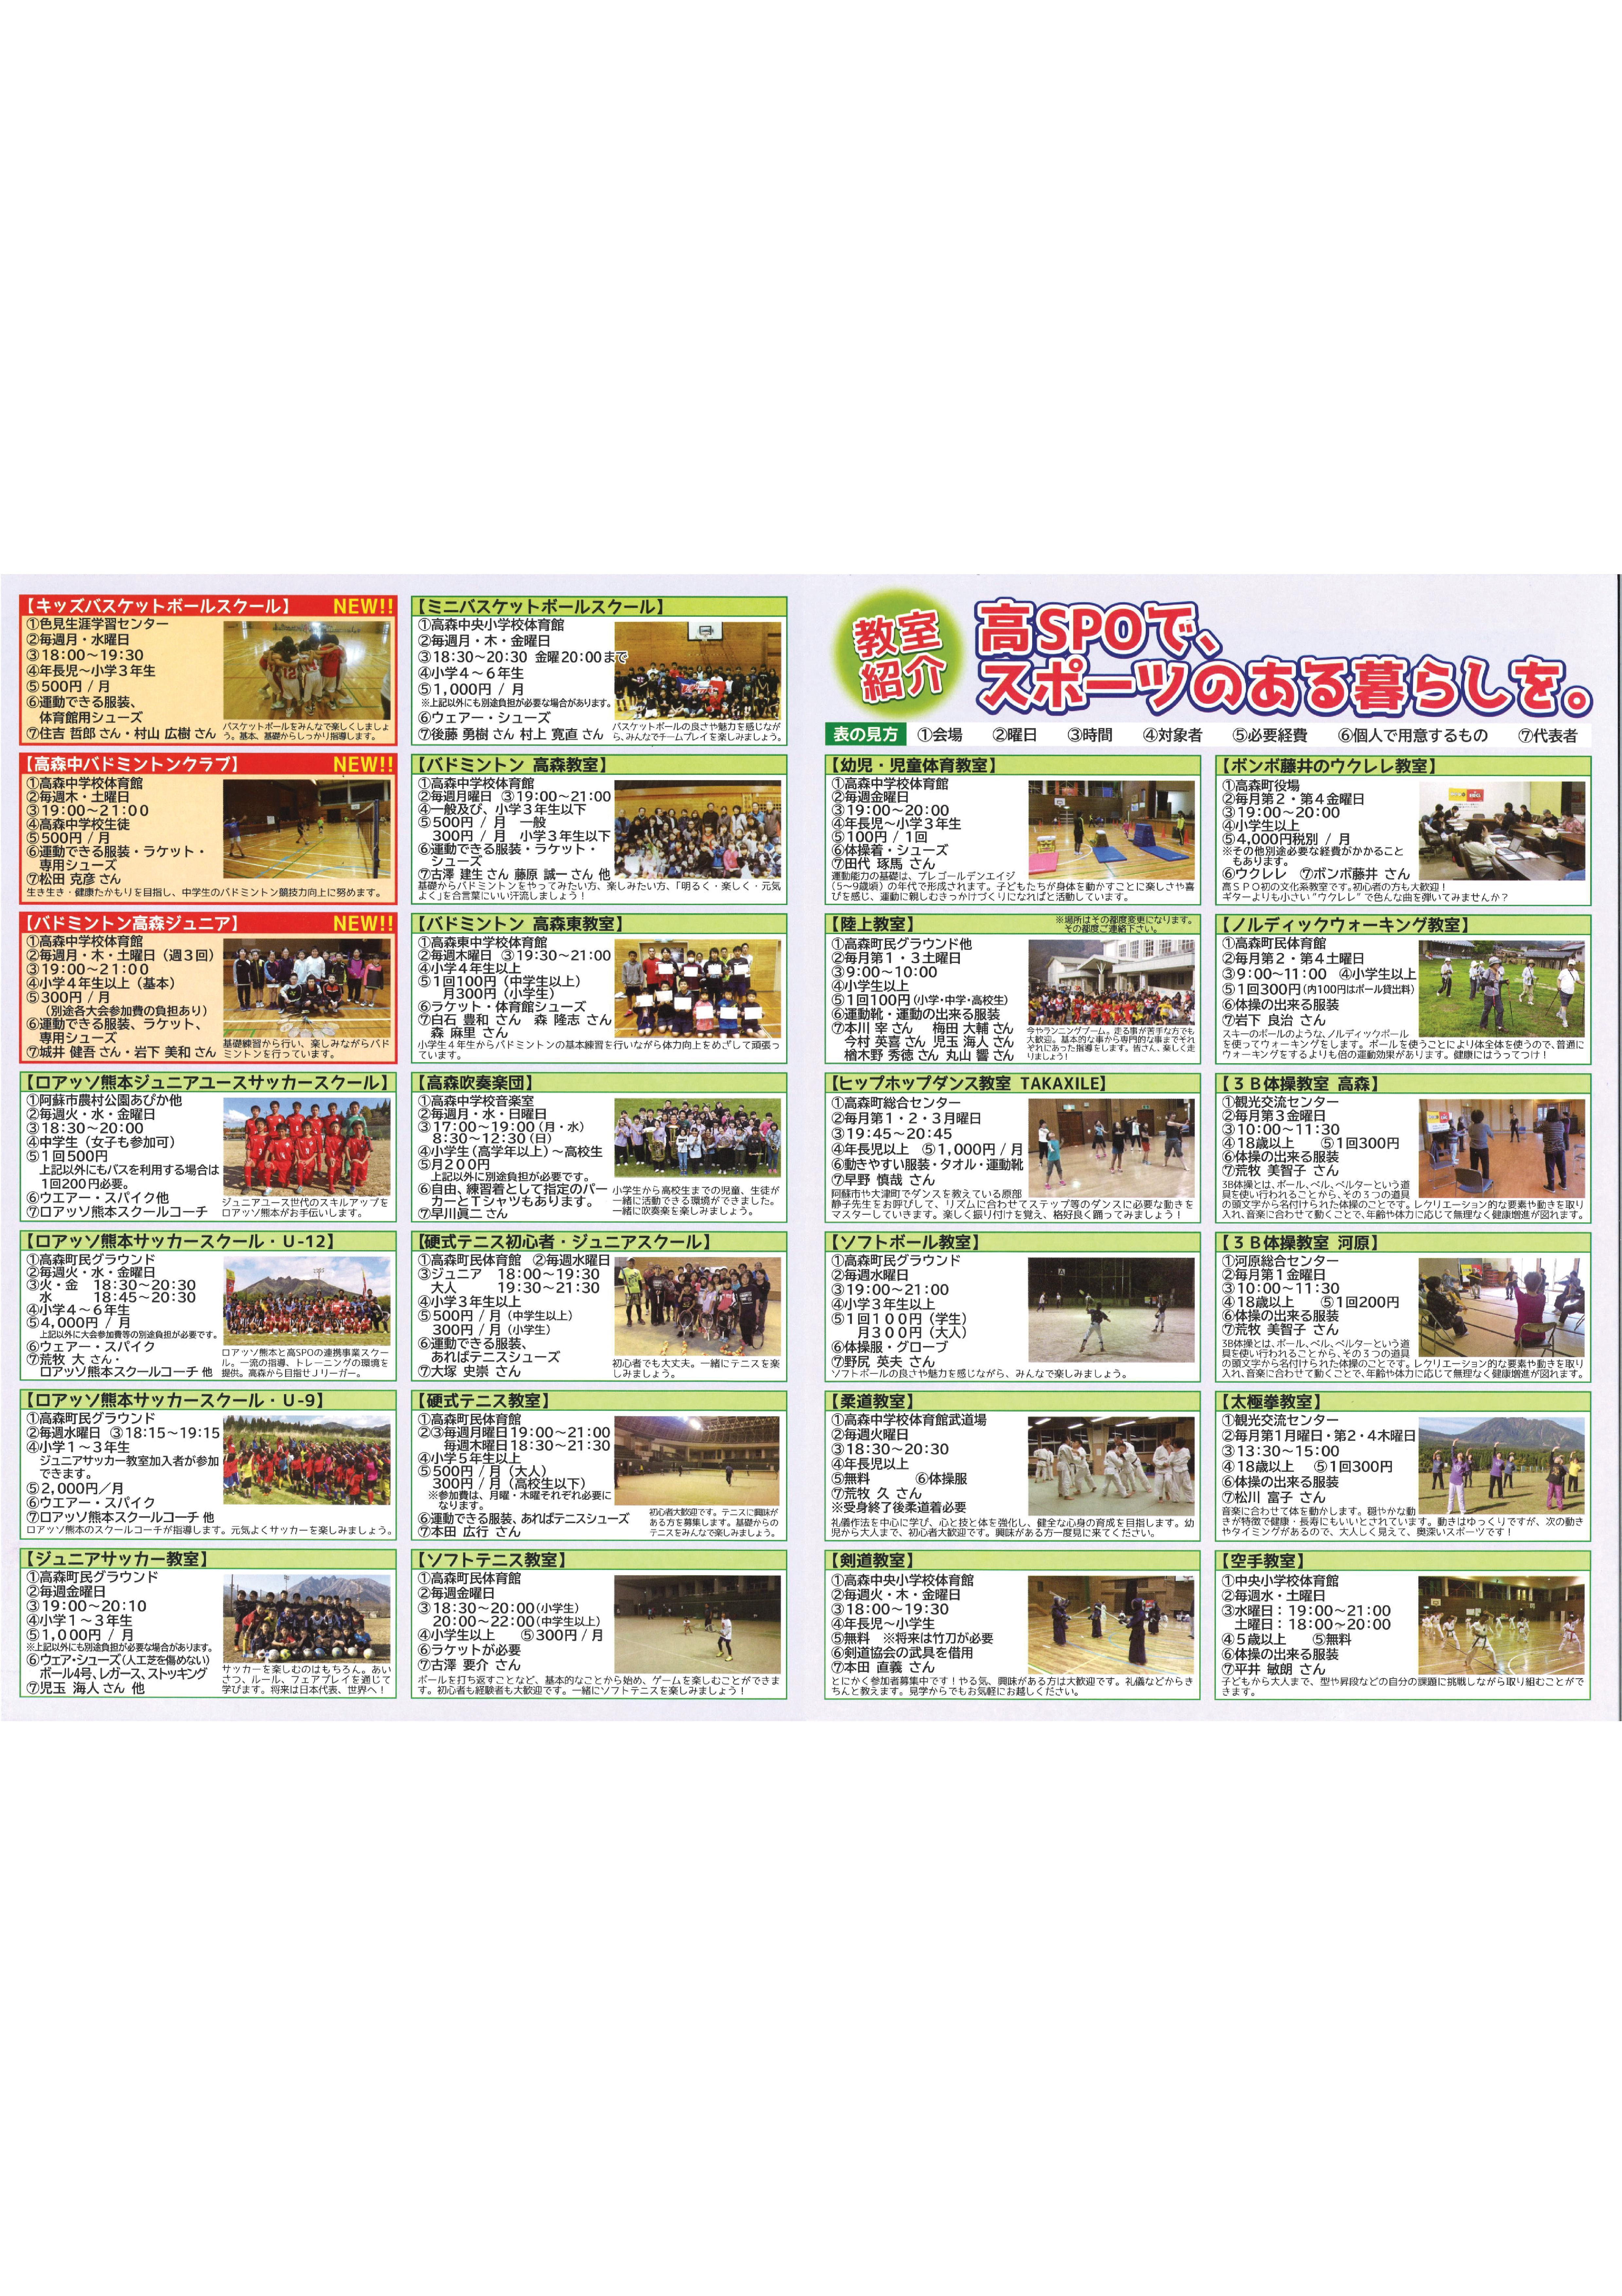 http://www.town.takamori.kumamoto.jp/chosha/somu/upload/4cf54c7e3a00bc5c75477b9cf0f2fe5ce9444f42.jpg